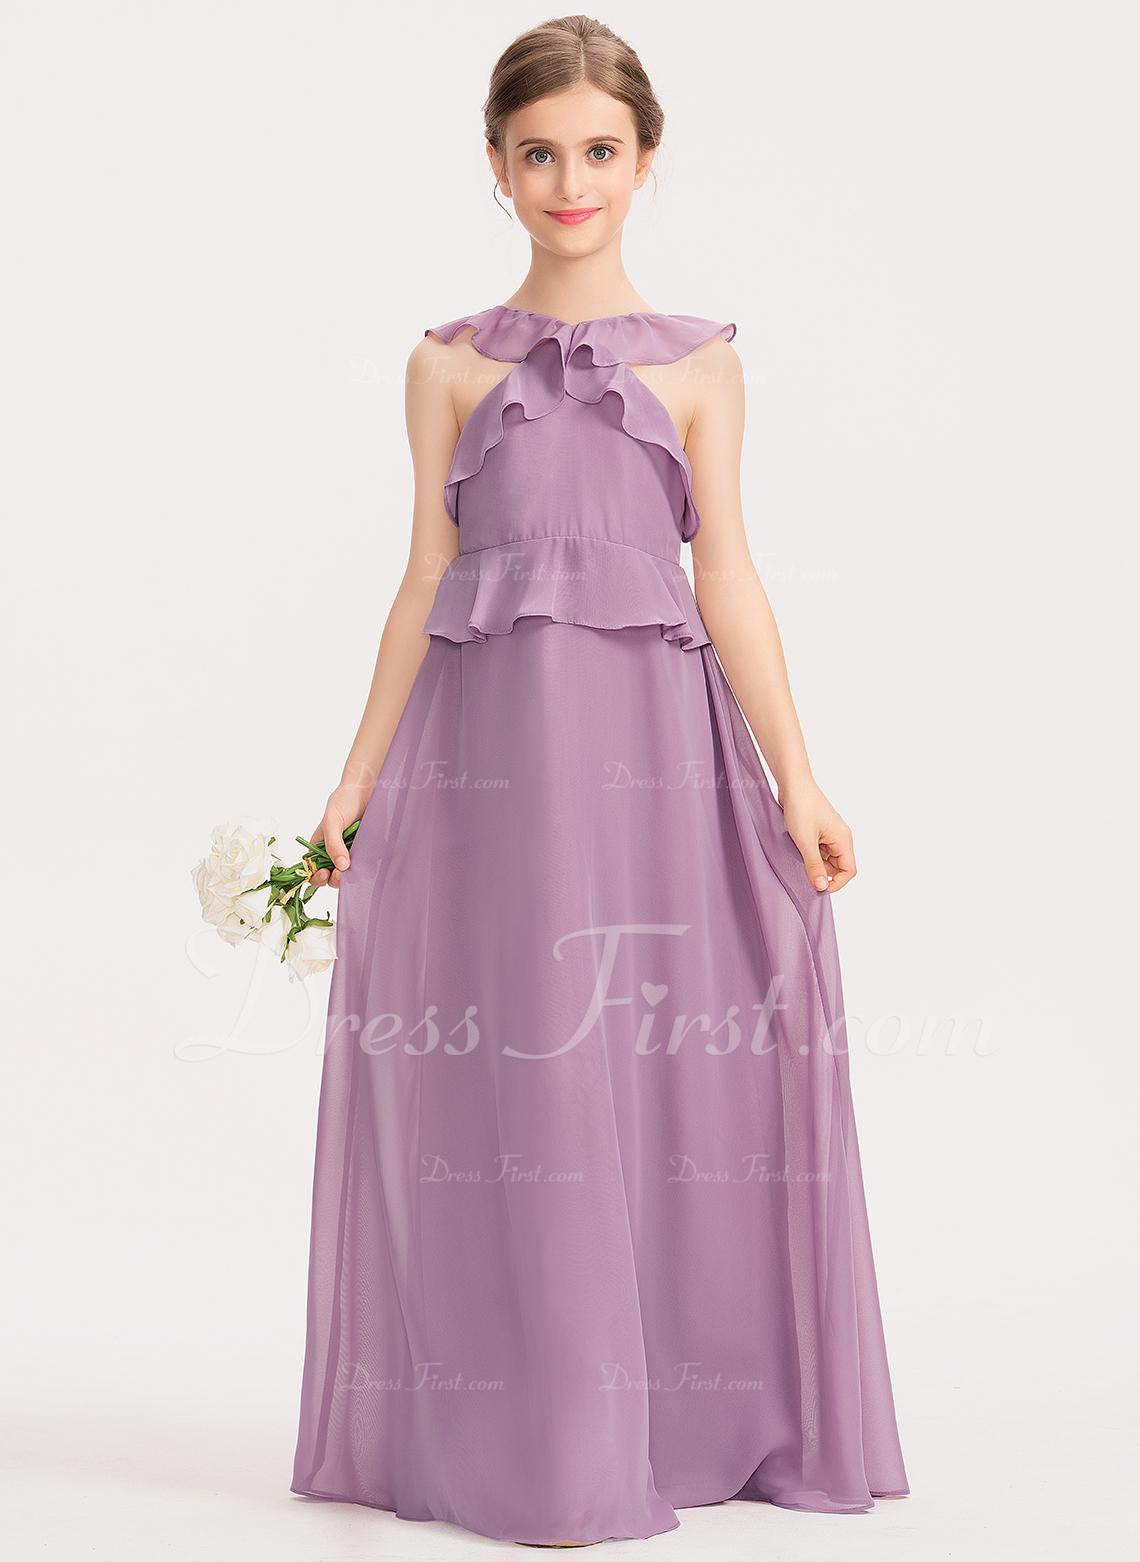 A-Line Scoop Neck Floor-Length Chiffon Junior Bridesmaid Dress With Cascading Ruffles